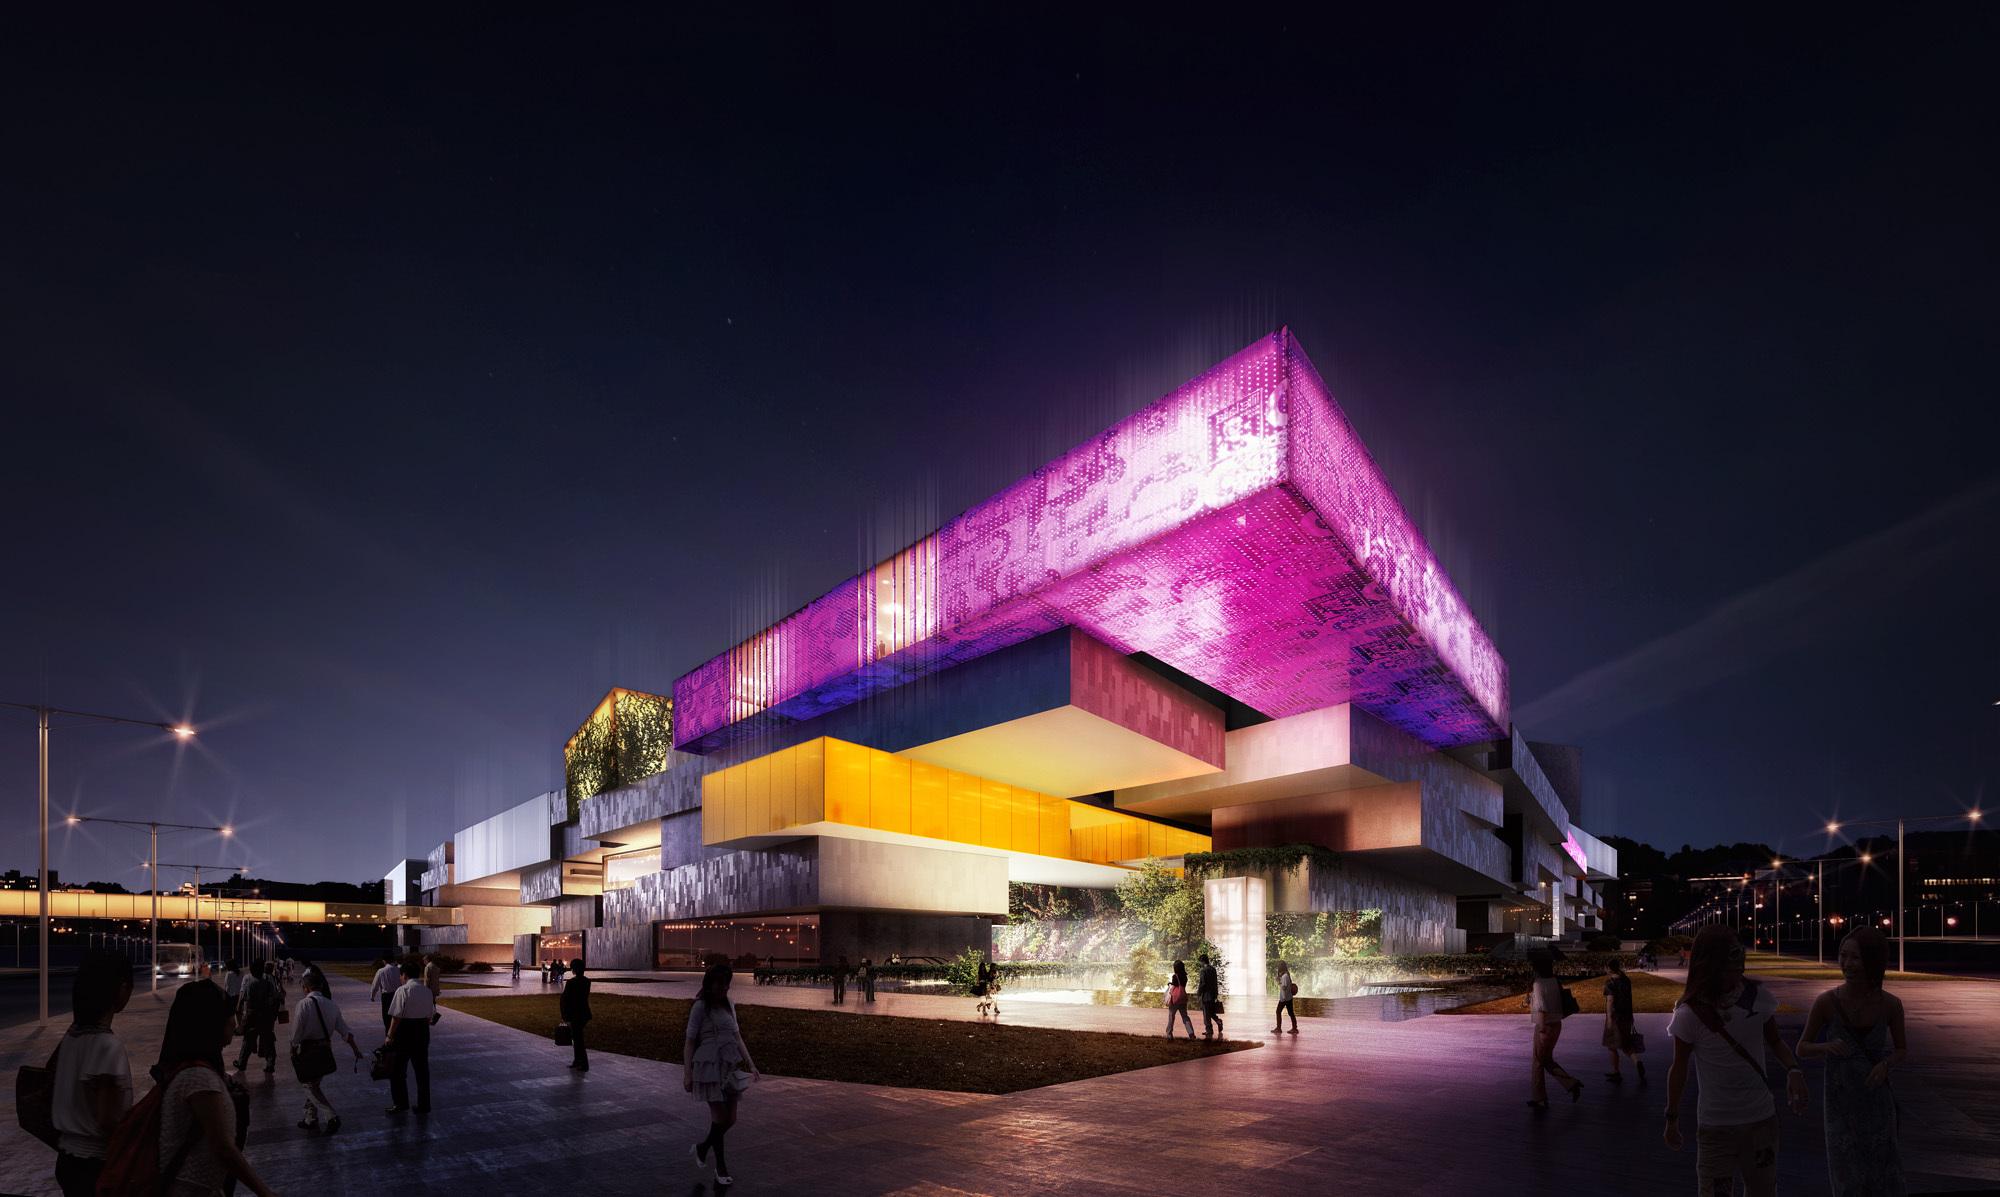 Gallery Of Summer International Shopping Mall 10 Design 3